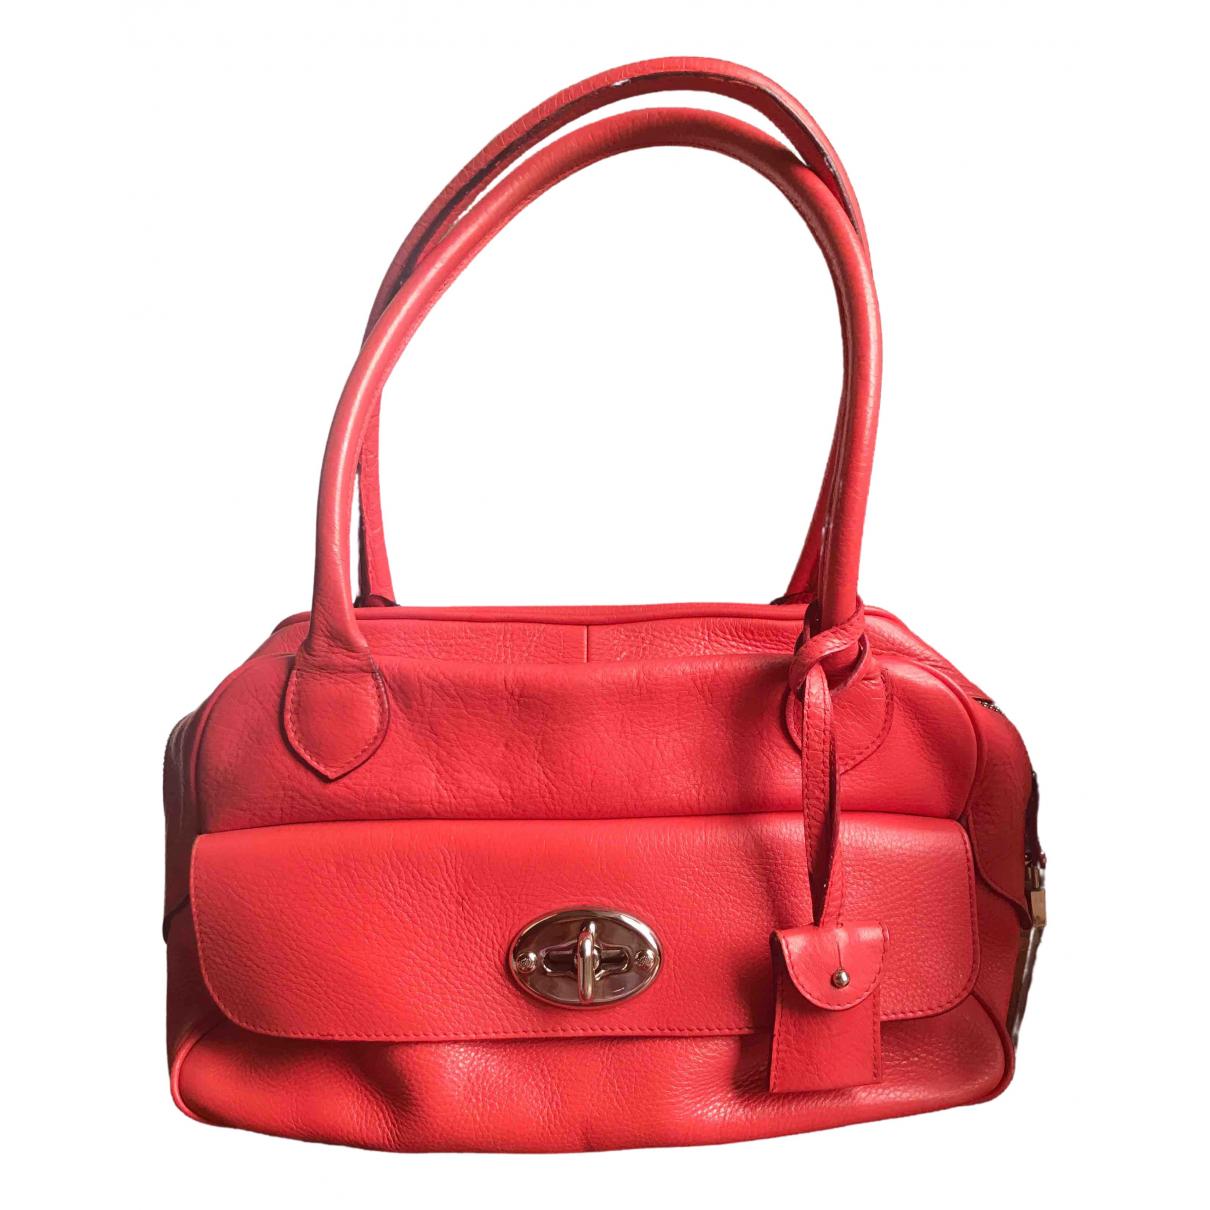 Mulberry \N Orange Leather handbag for Women \N